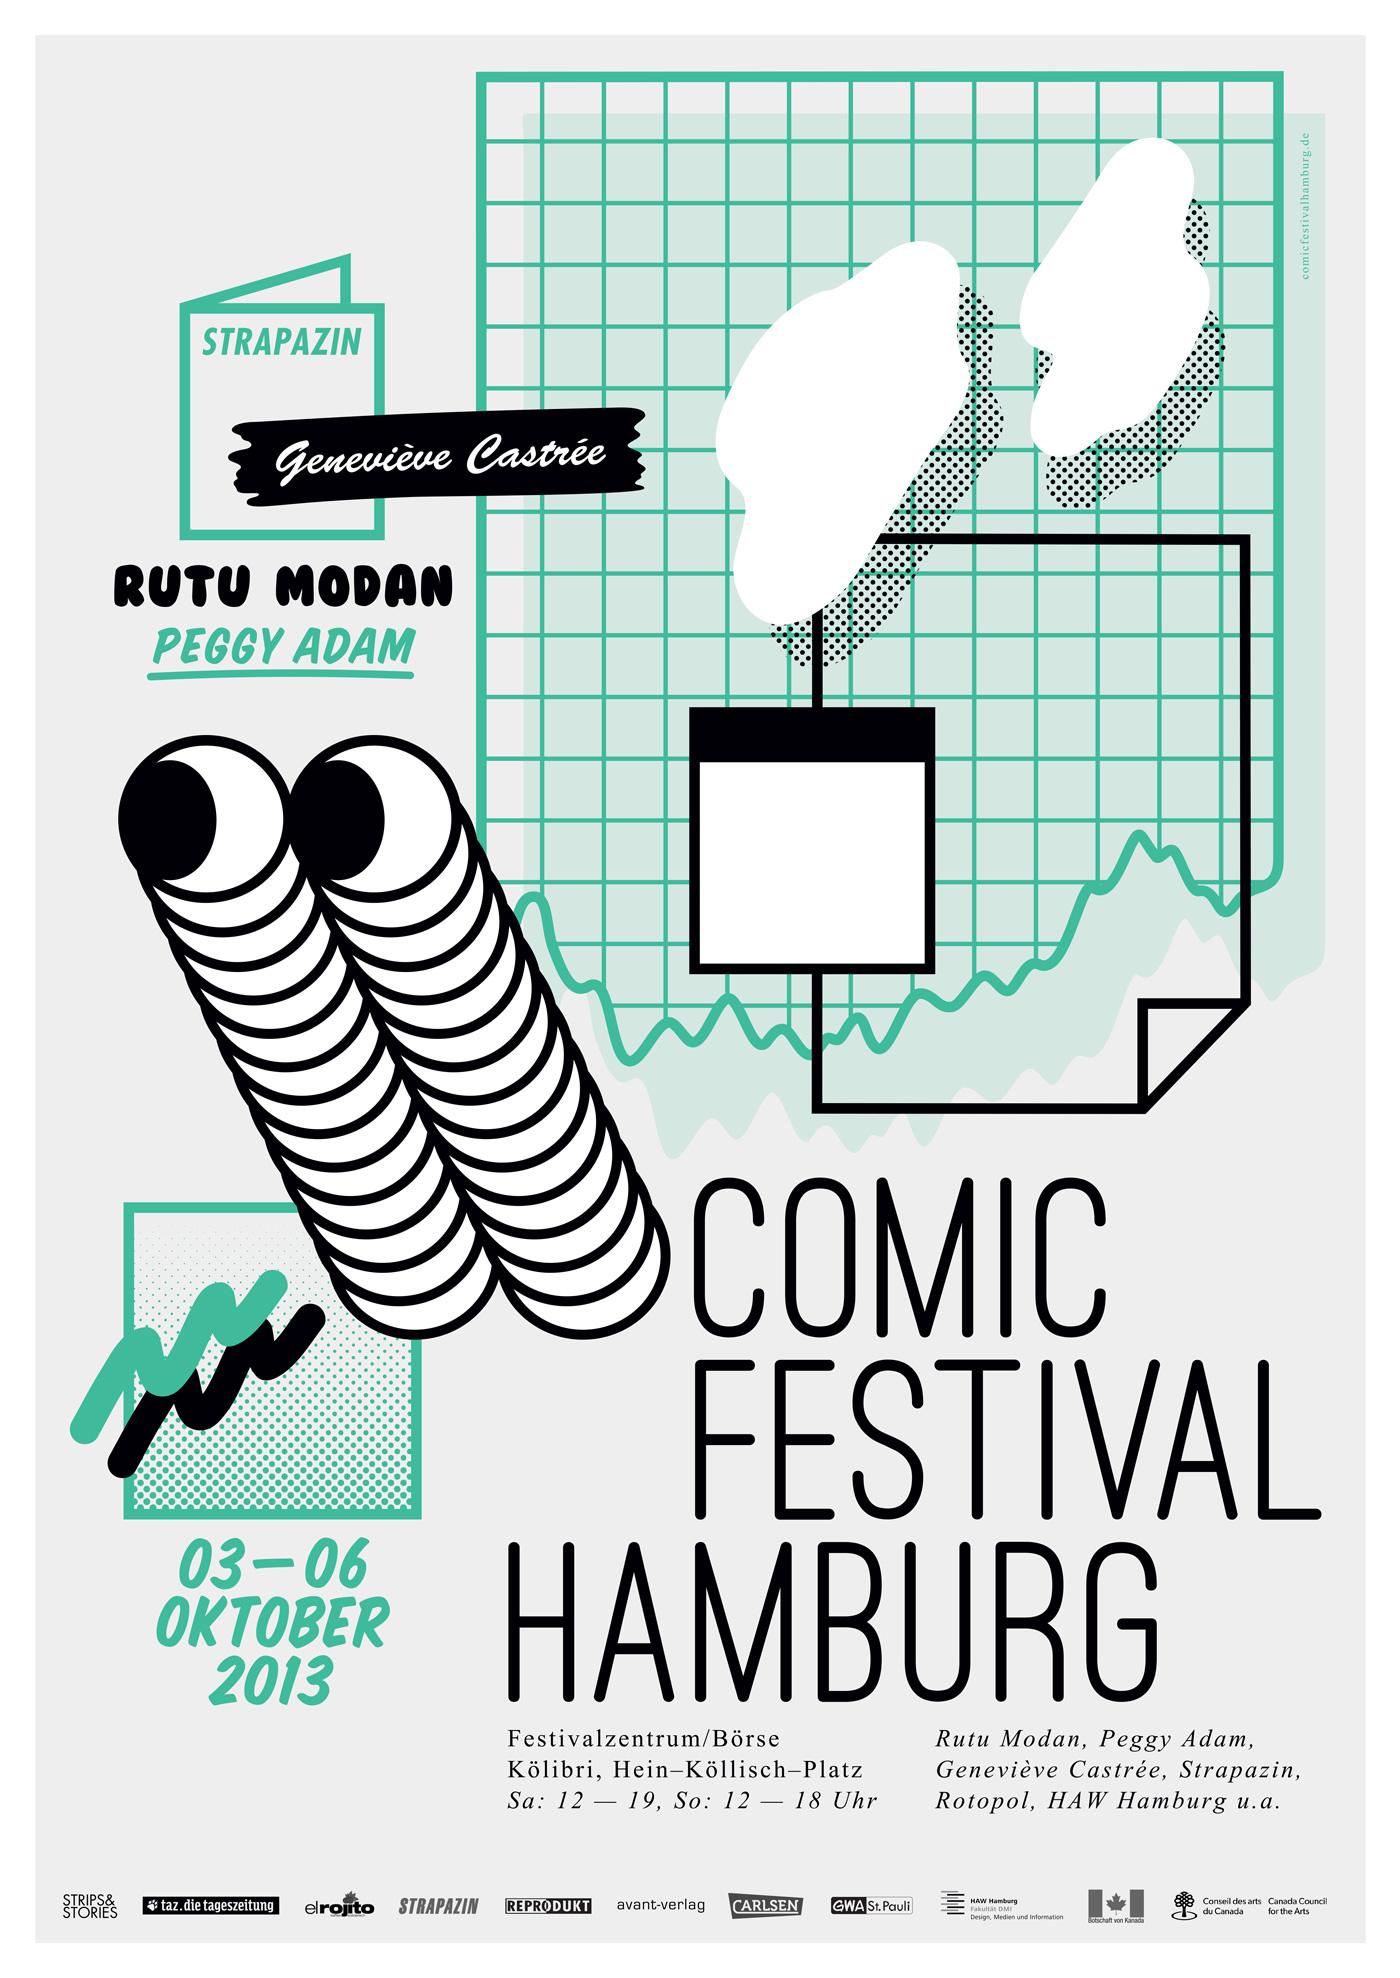 Comicfestival Hamburg 2013